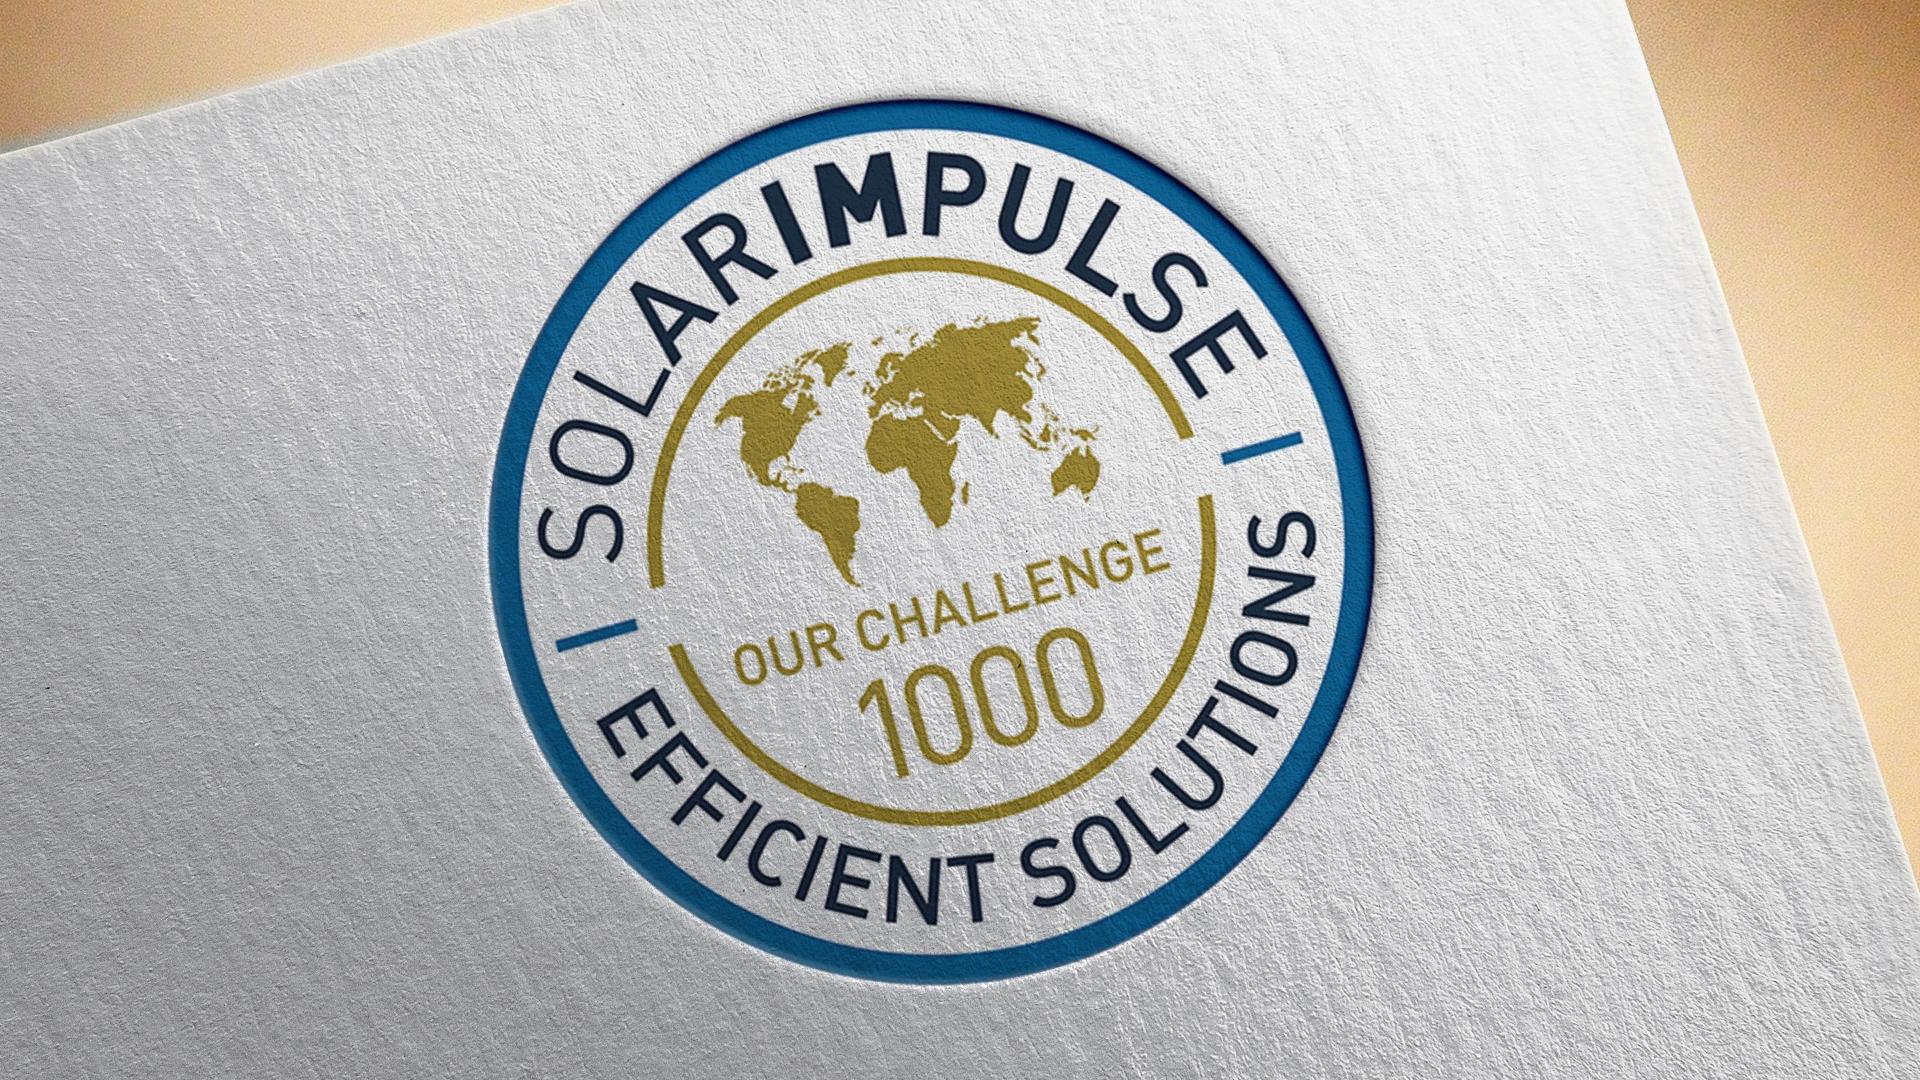 Solar Impulse Efficient Solution Label